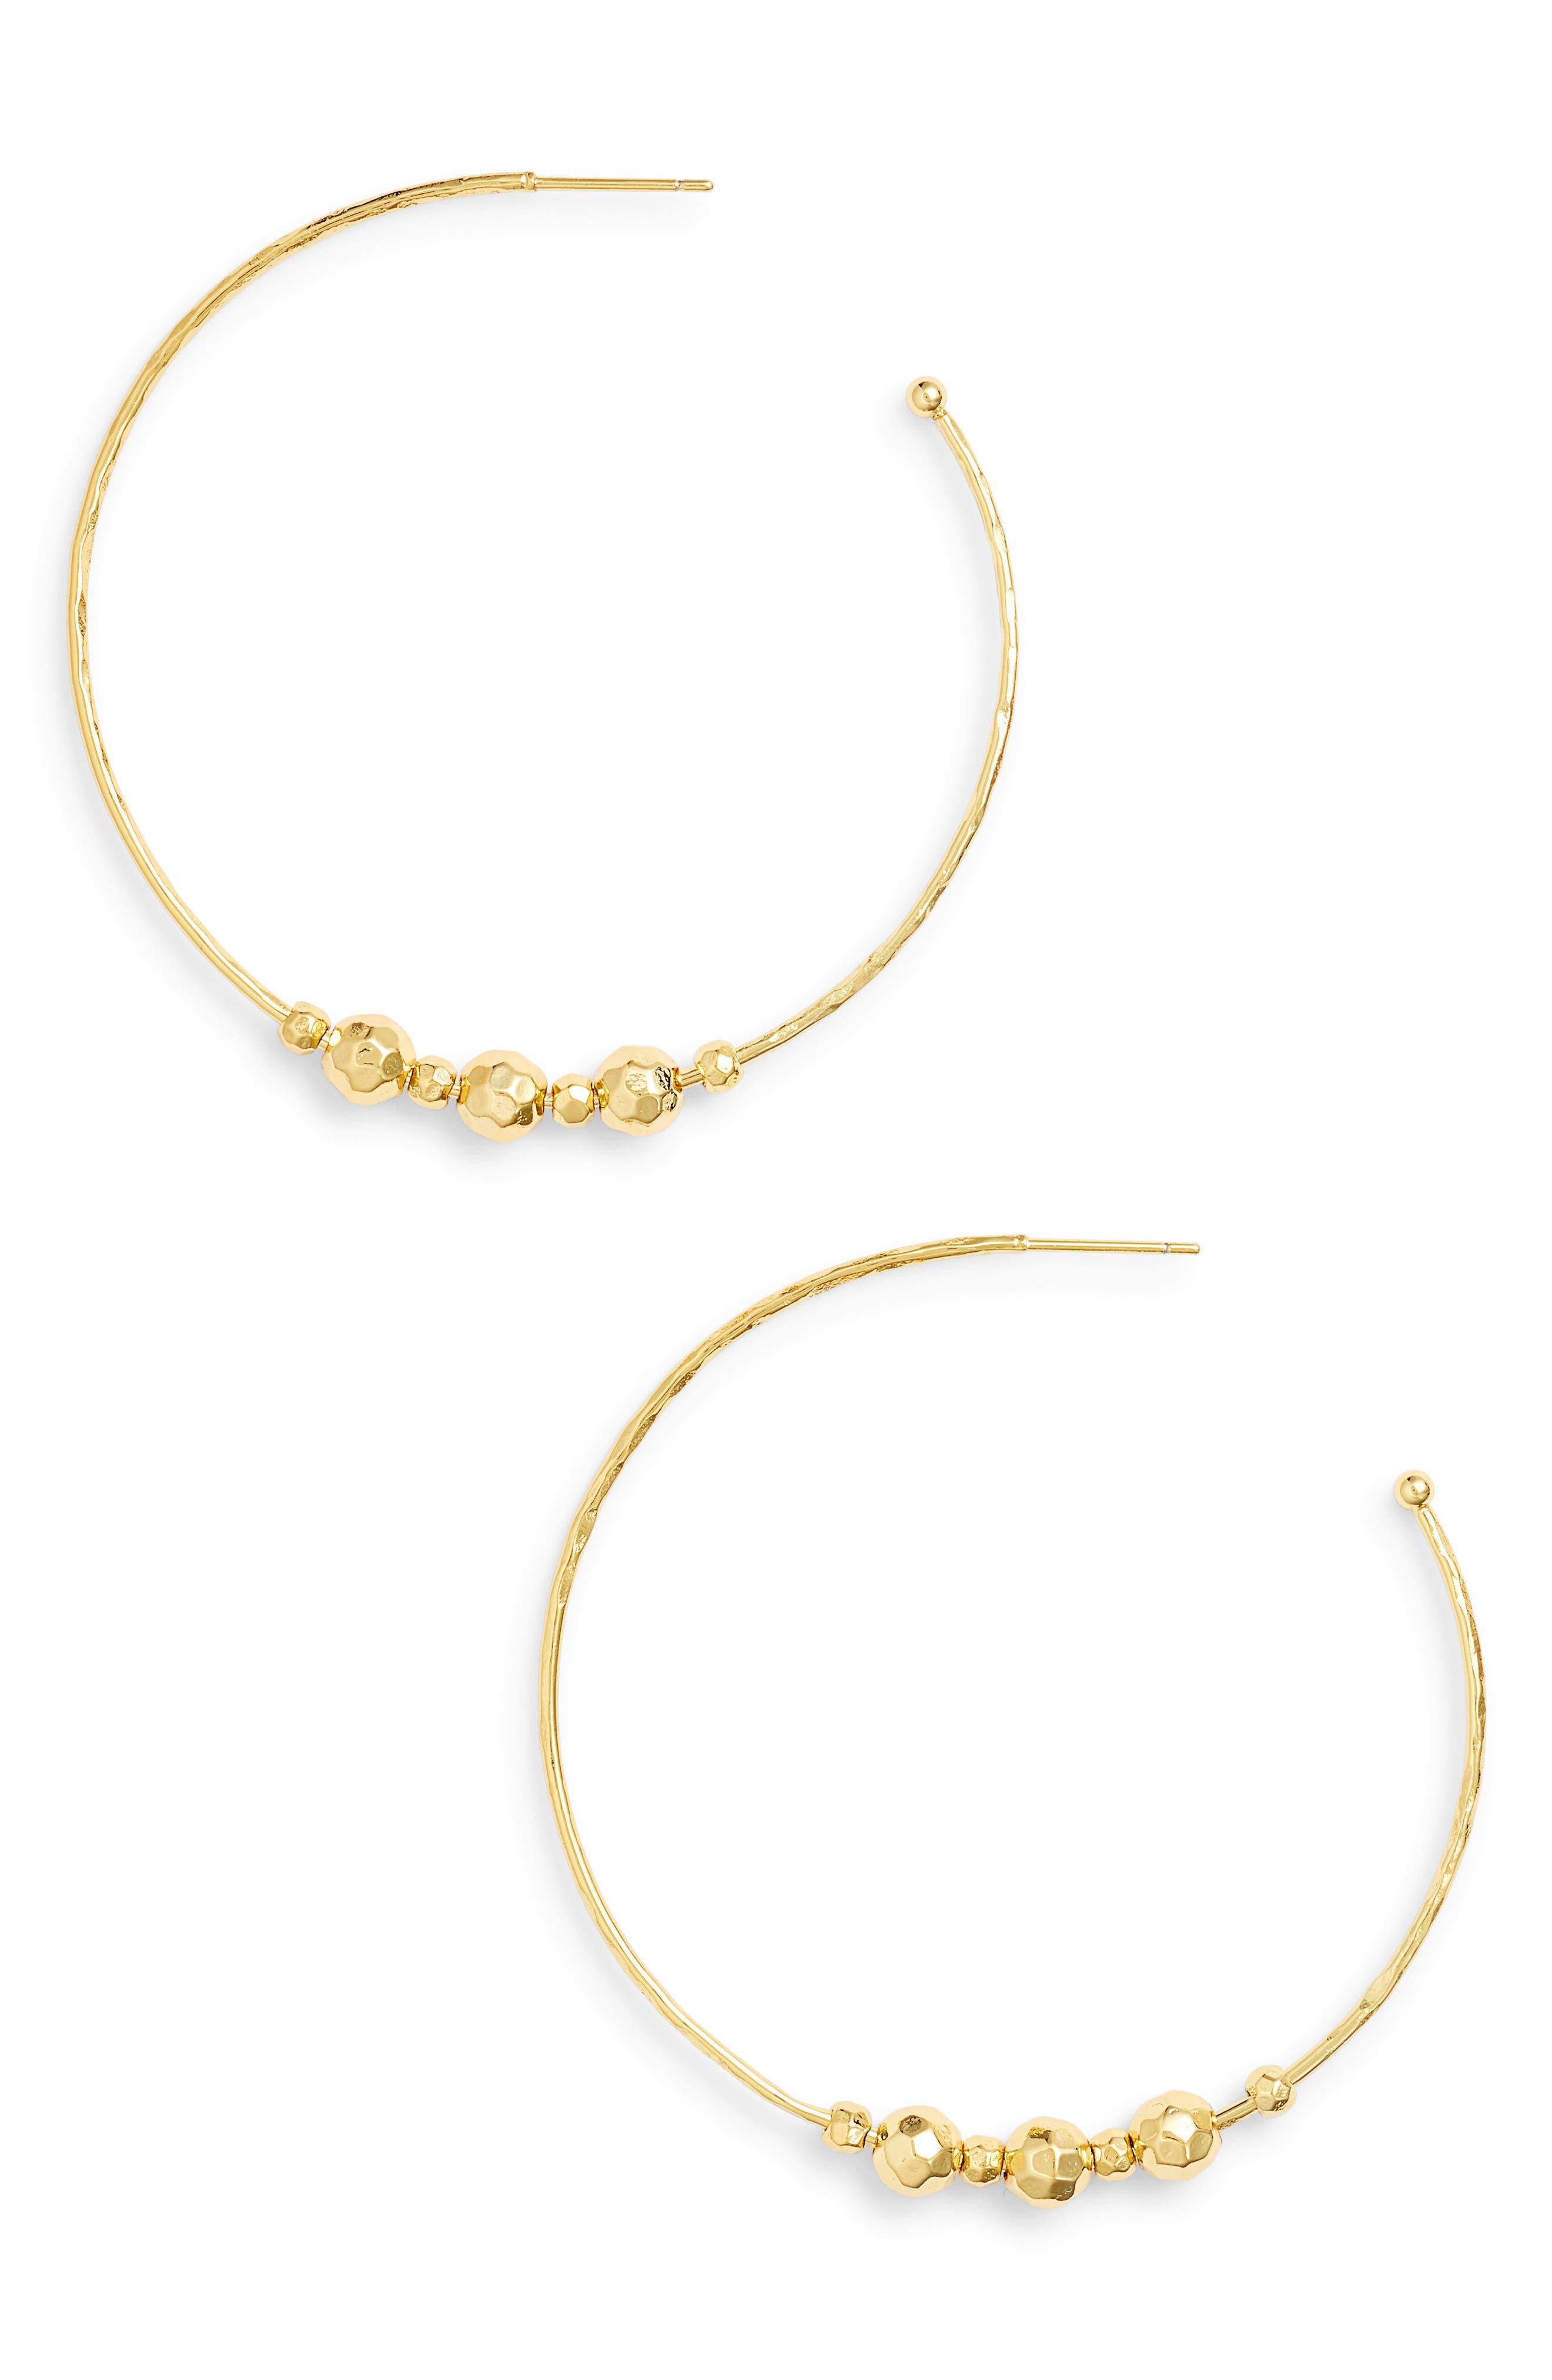 Taner Bead Hoop Earrings,                             Main thumbnail 1, color,                             Gold